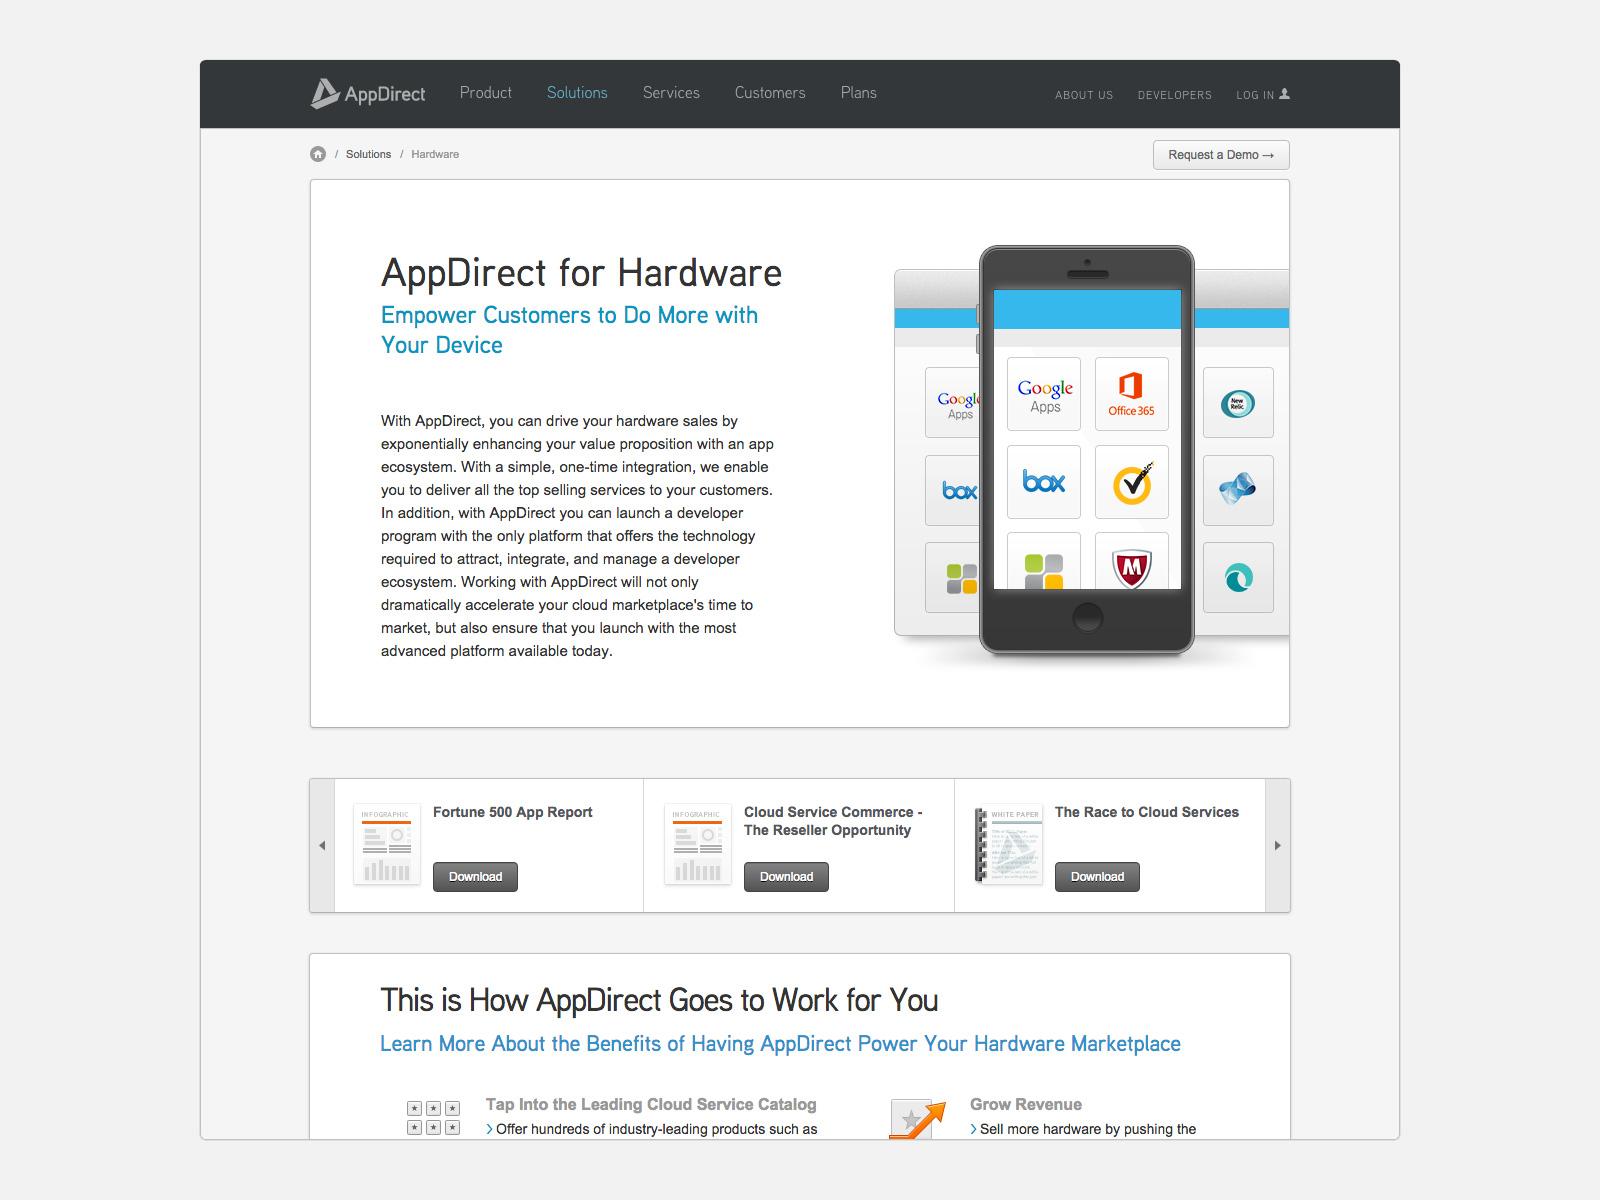 ad-solutions-hardware.jpg